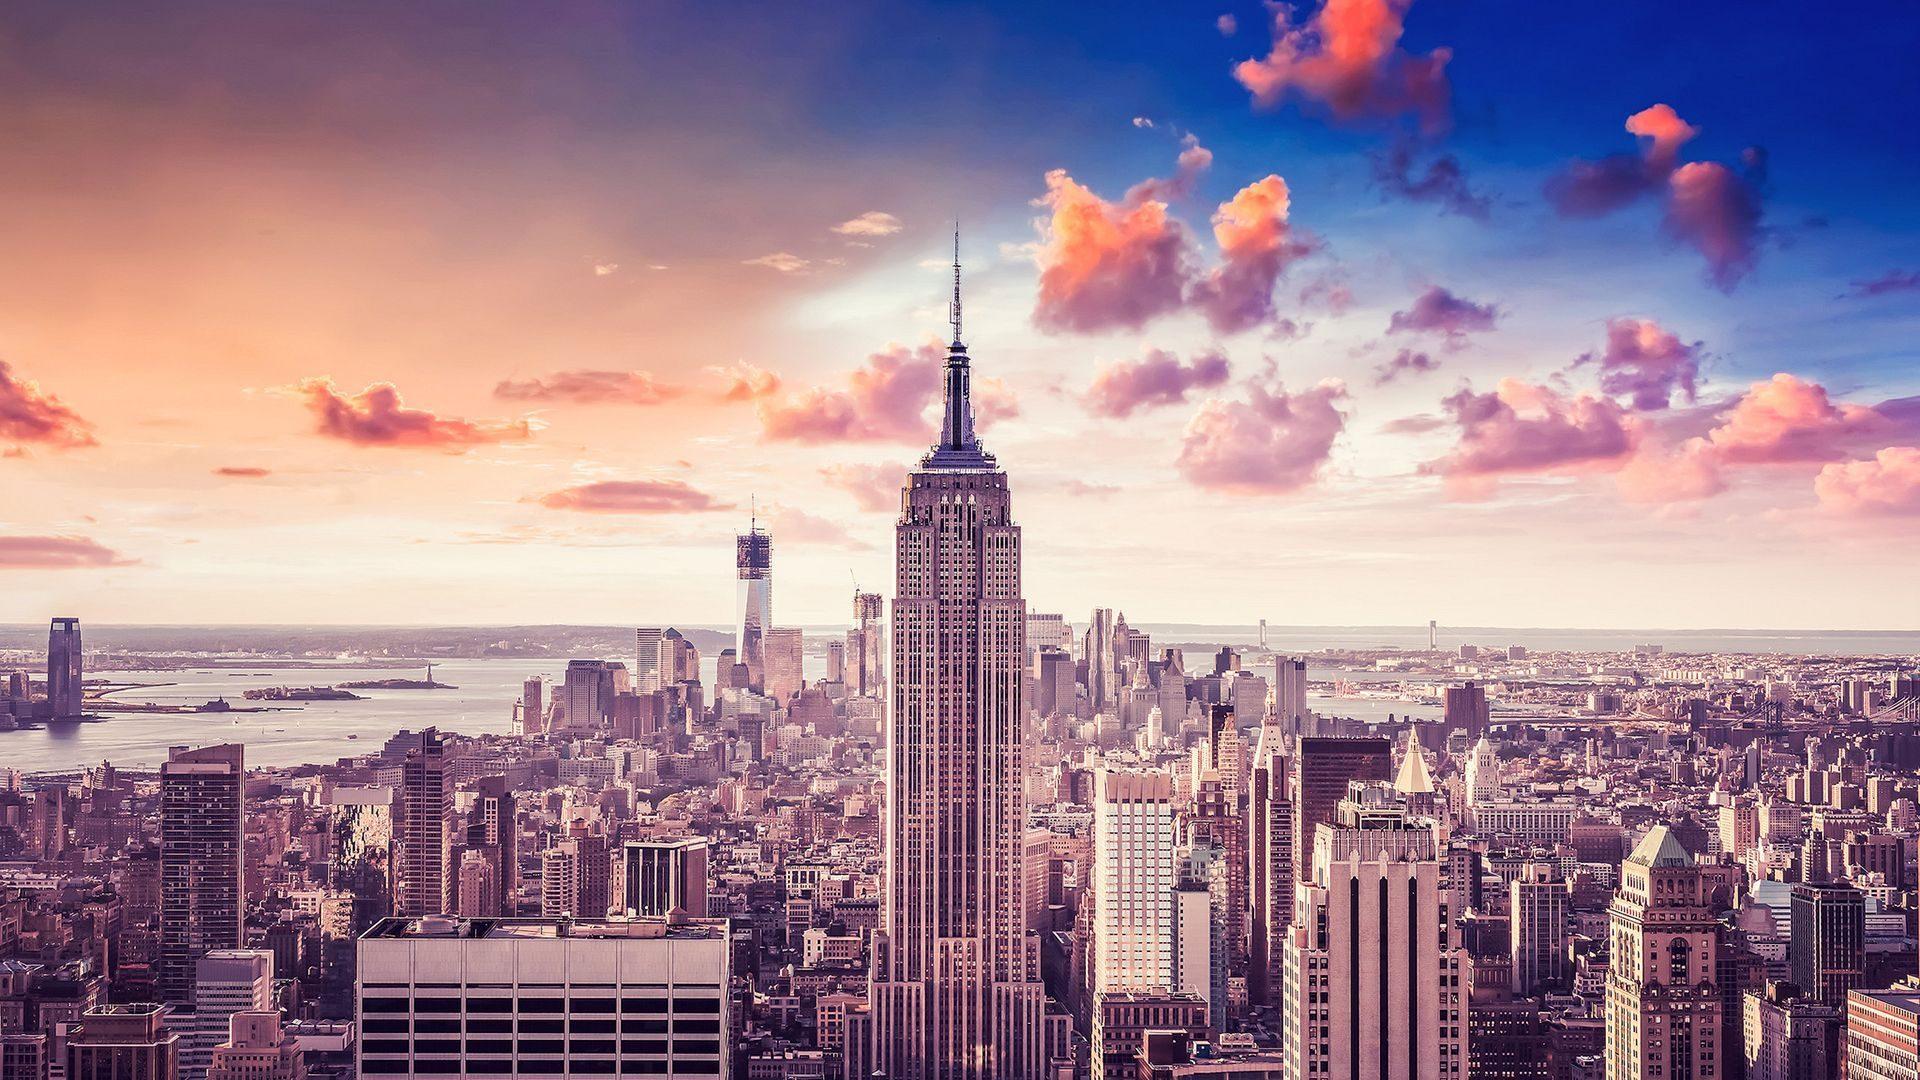 Free Download New York Hd Wallpaper Download Desktop Wallpapers Hd 4k High 1920x1080 For Your Desktop Mobile Tablet Explore 21 New York Wallpapers Hd Hd New York Wallpaper New